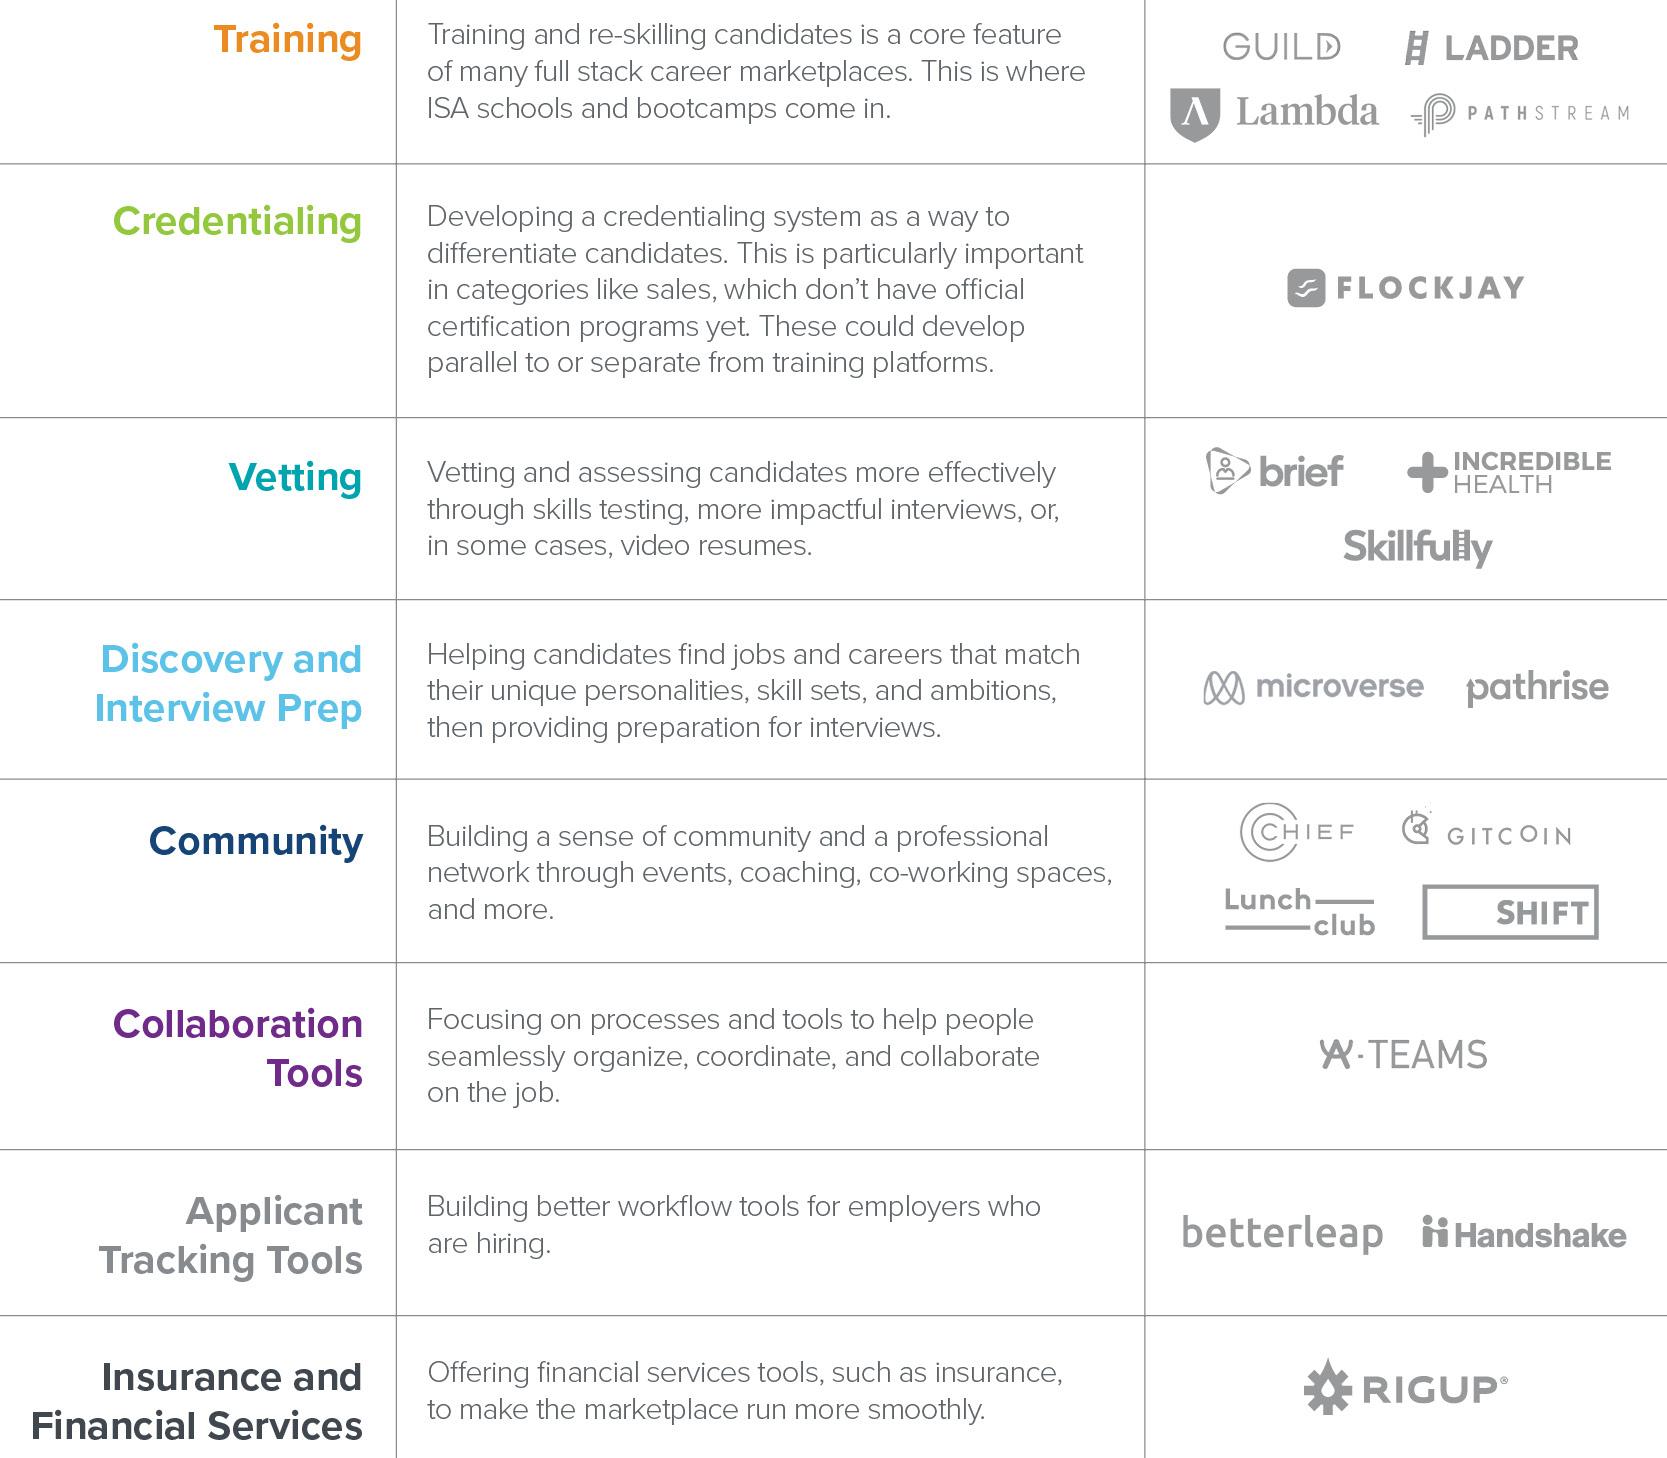 https://i0.wp.com/a16z.com/wp-content/uploads/2020/09/The-Rise-of-Full-Stack-Career-Marketplaces-R4-1.jpg?ssl=1